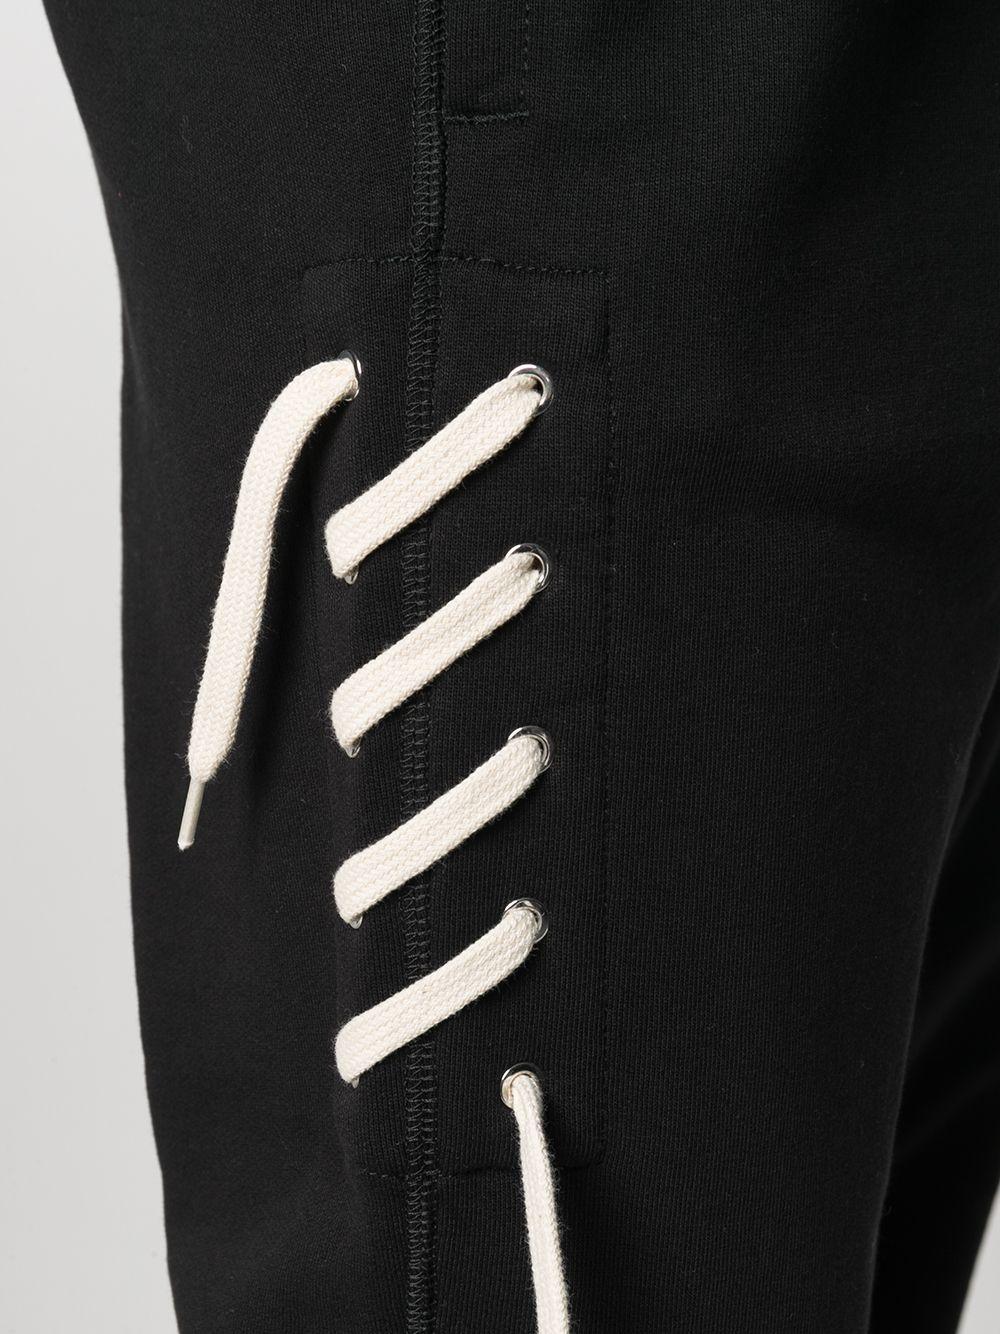 LACES TROUSERS CRAIG GREEN   Trousers   CGSS21CJETRP01BLACK/CREAM